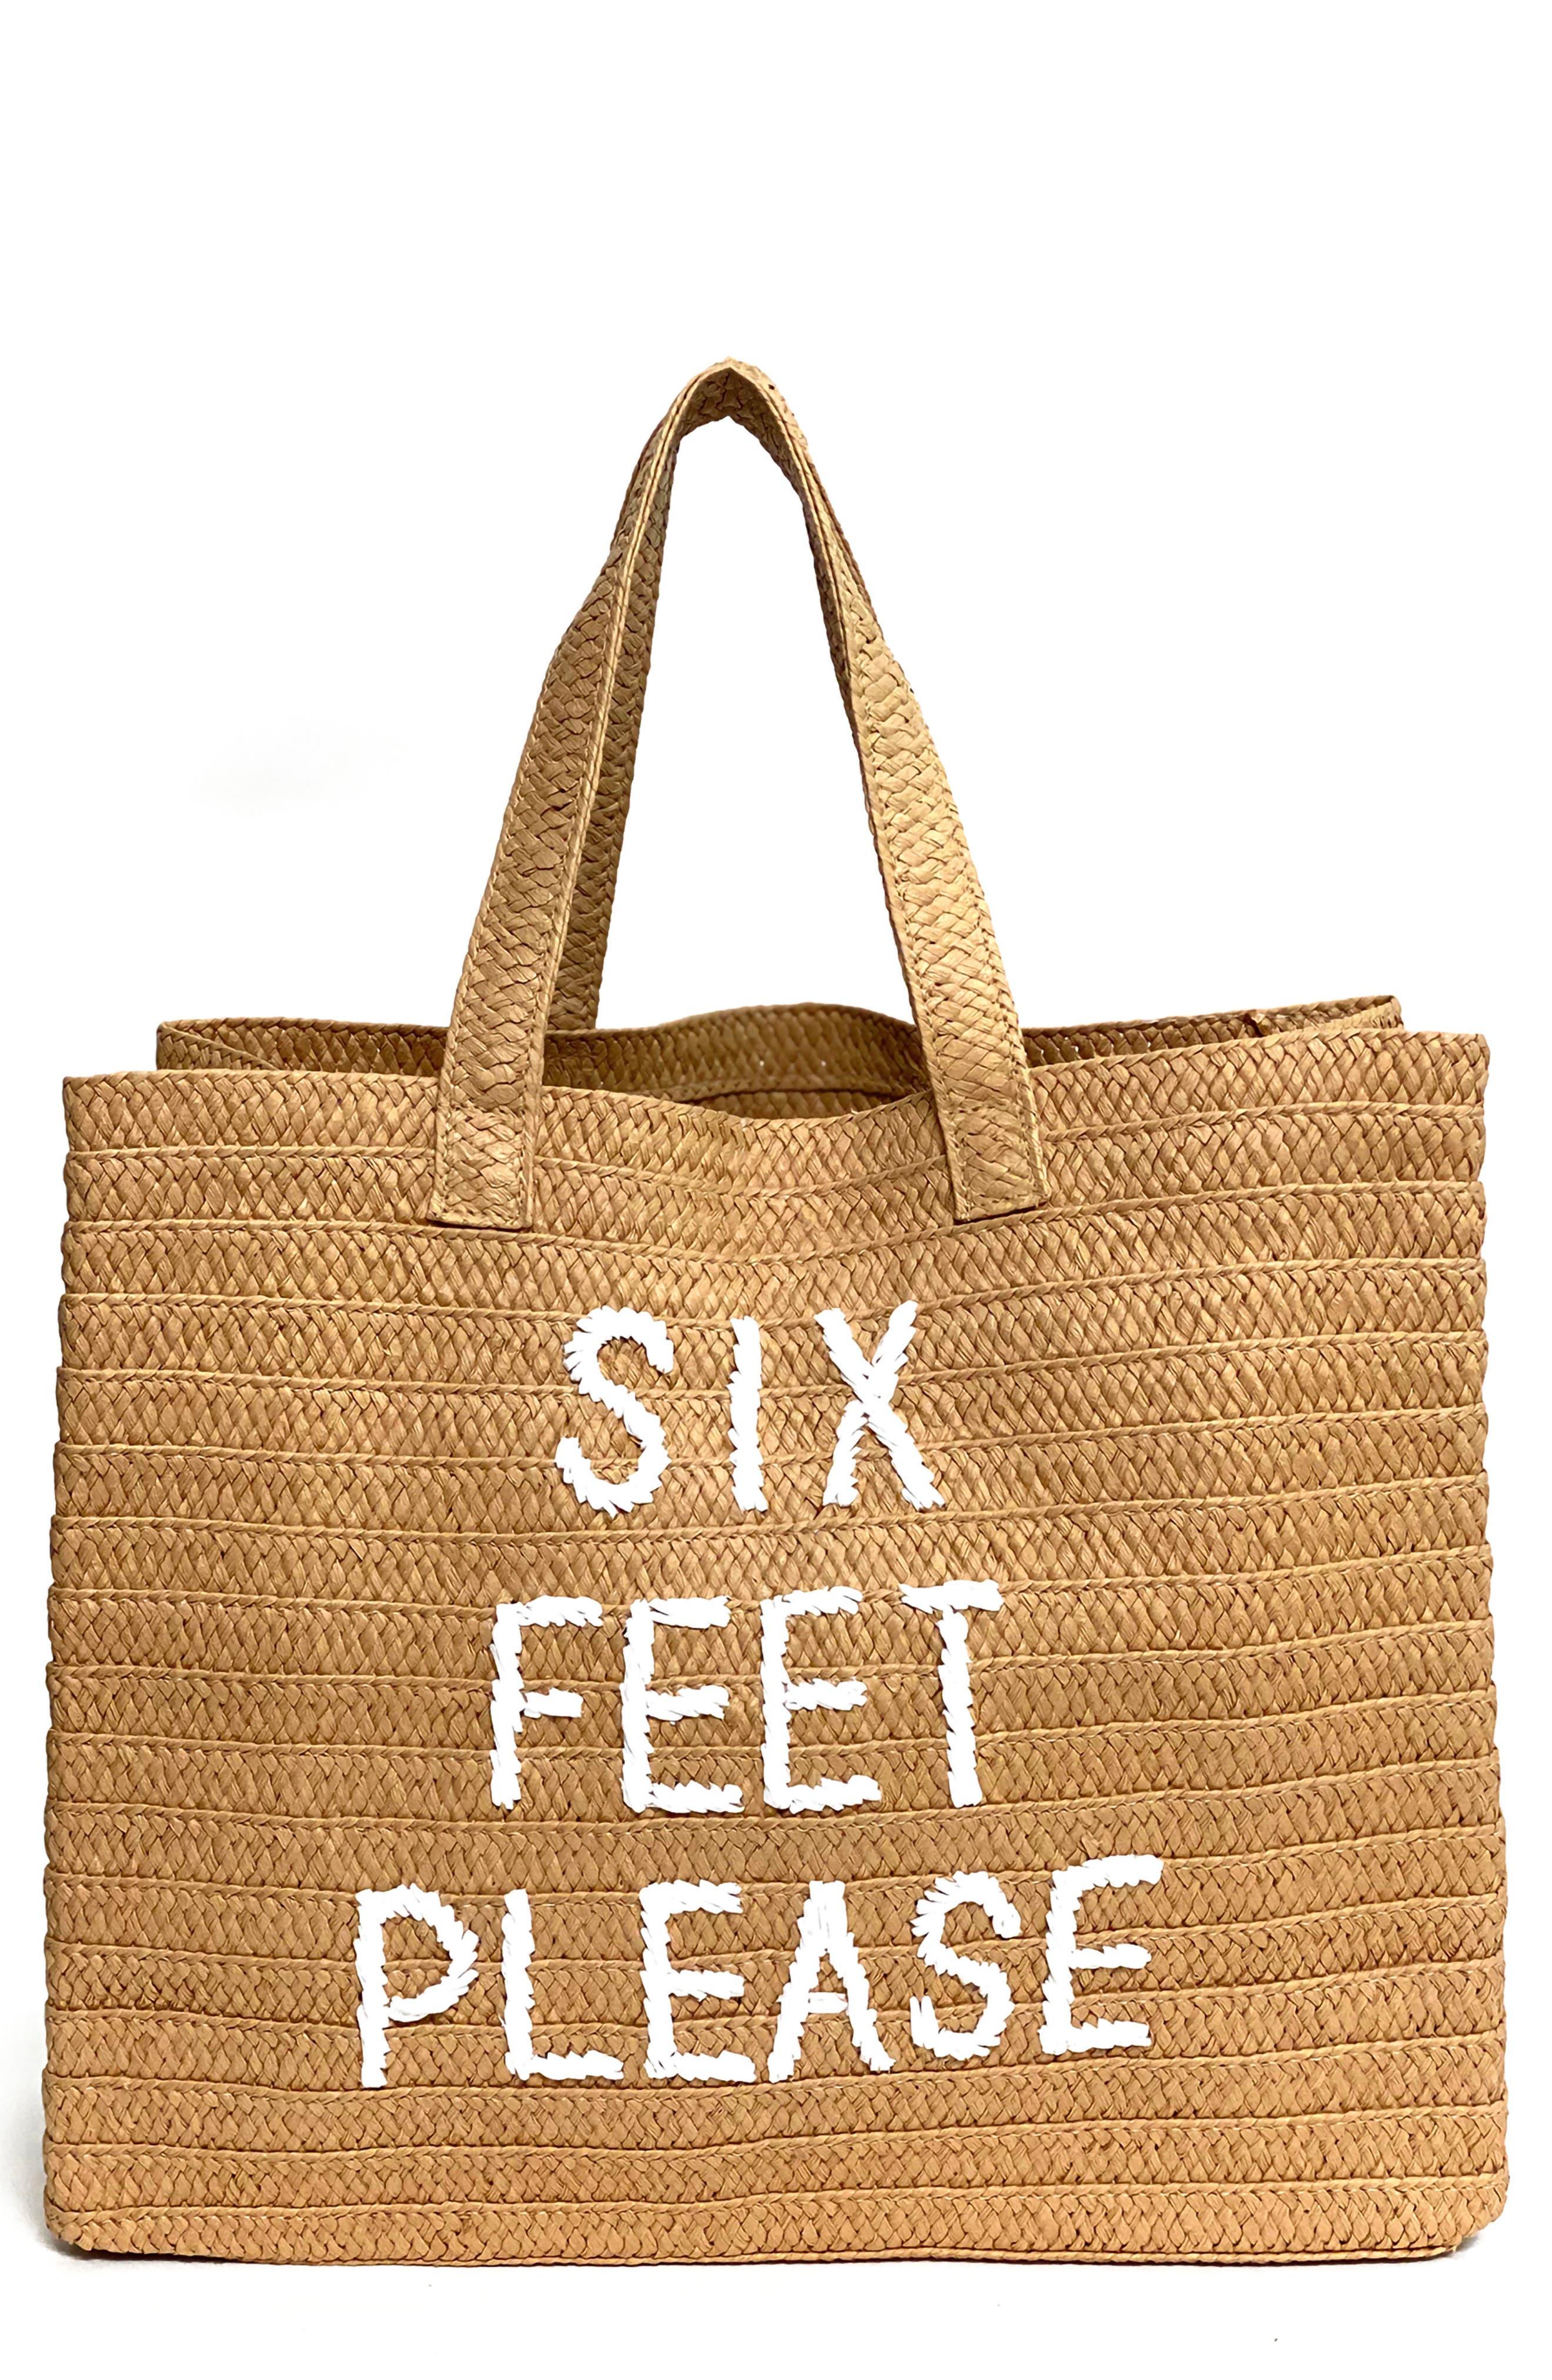 Six Feet Please Woven Tote